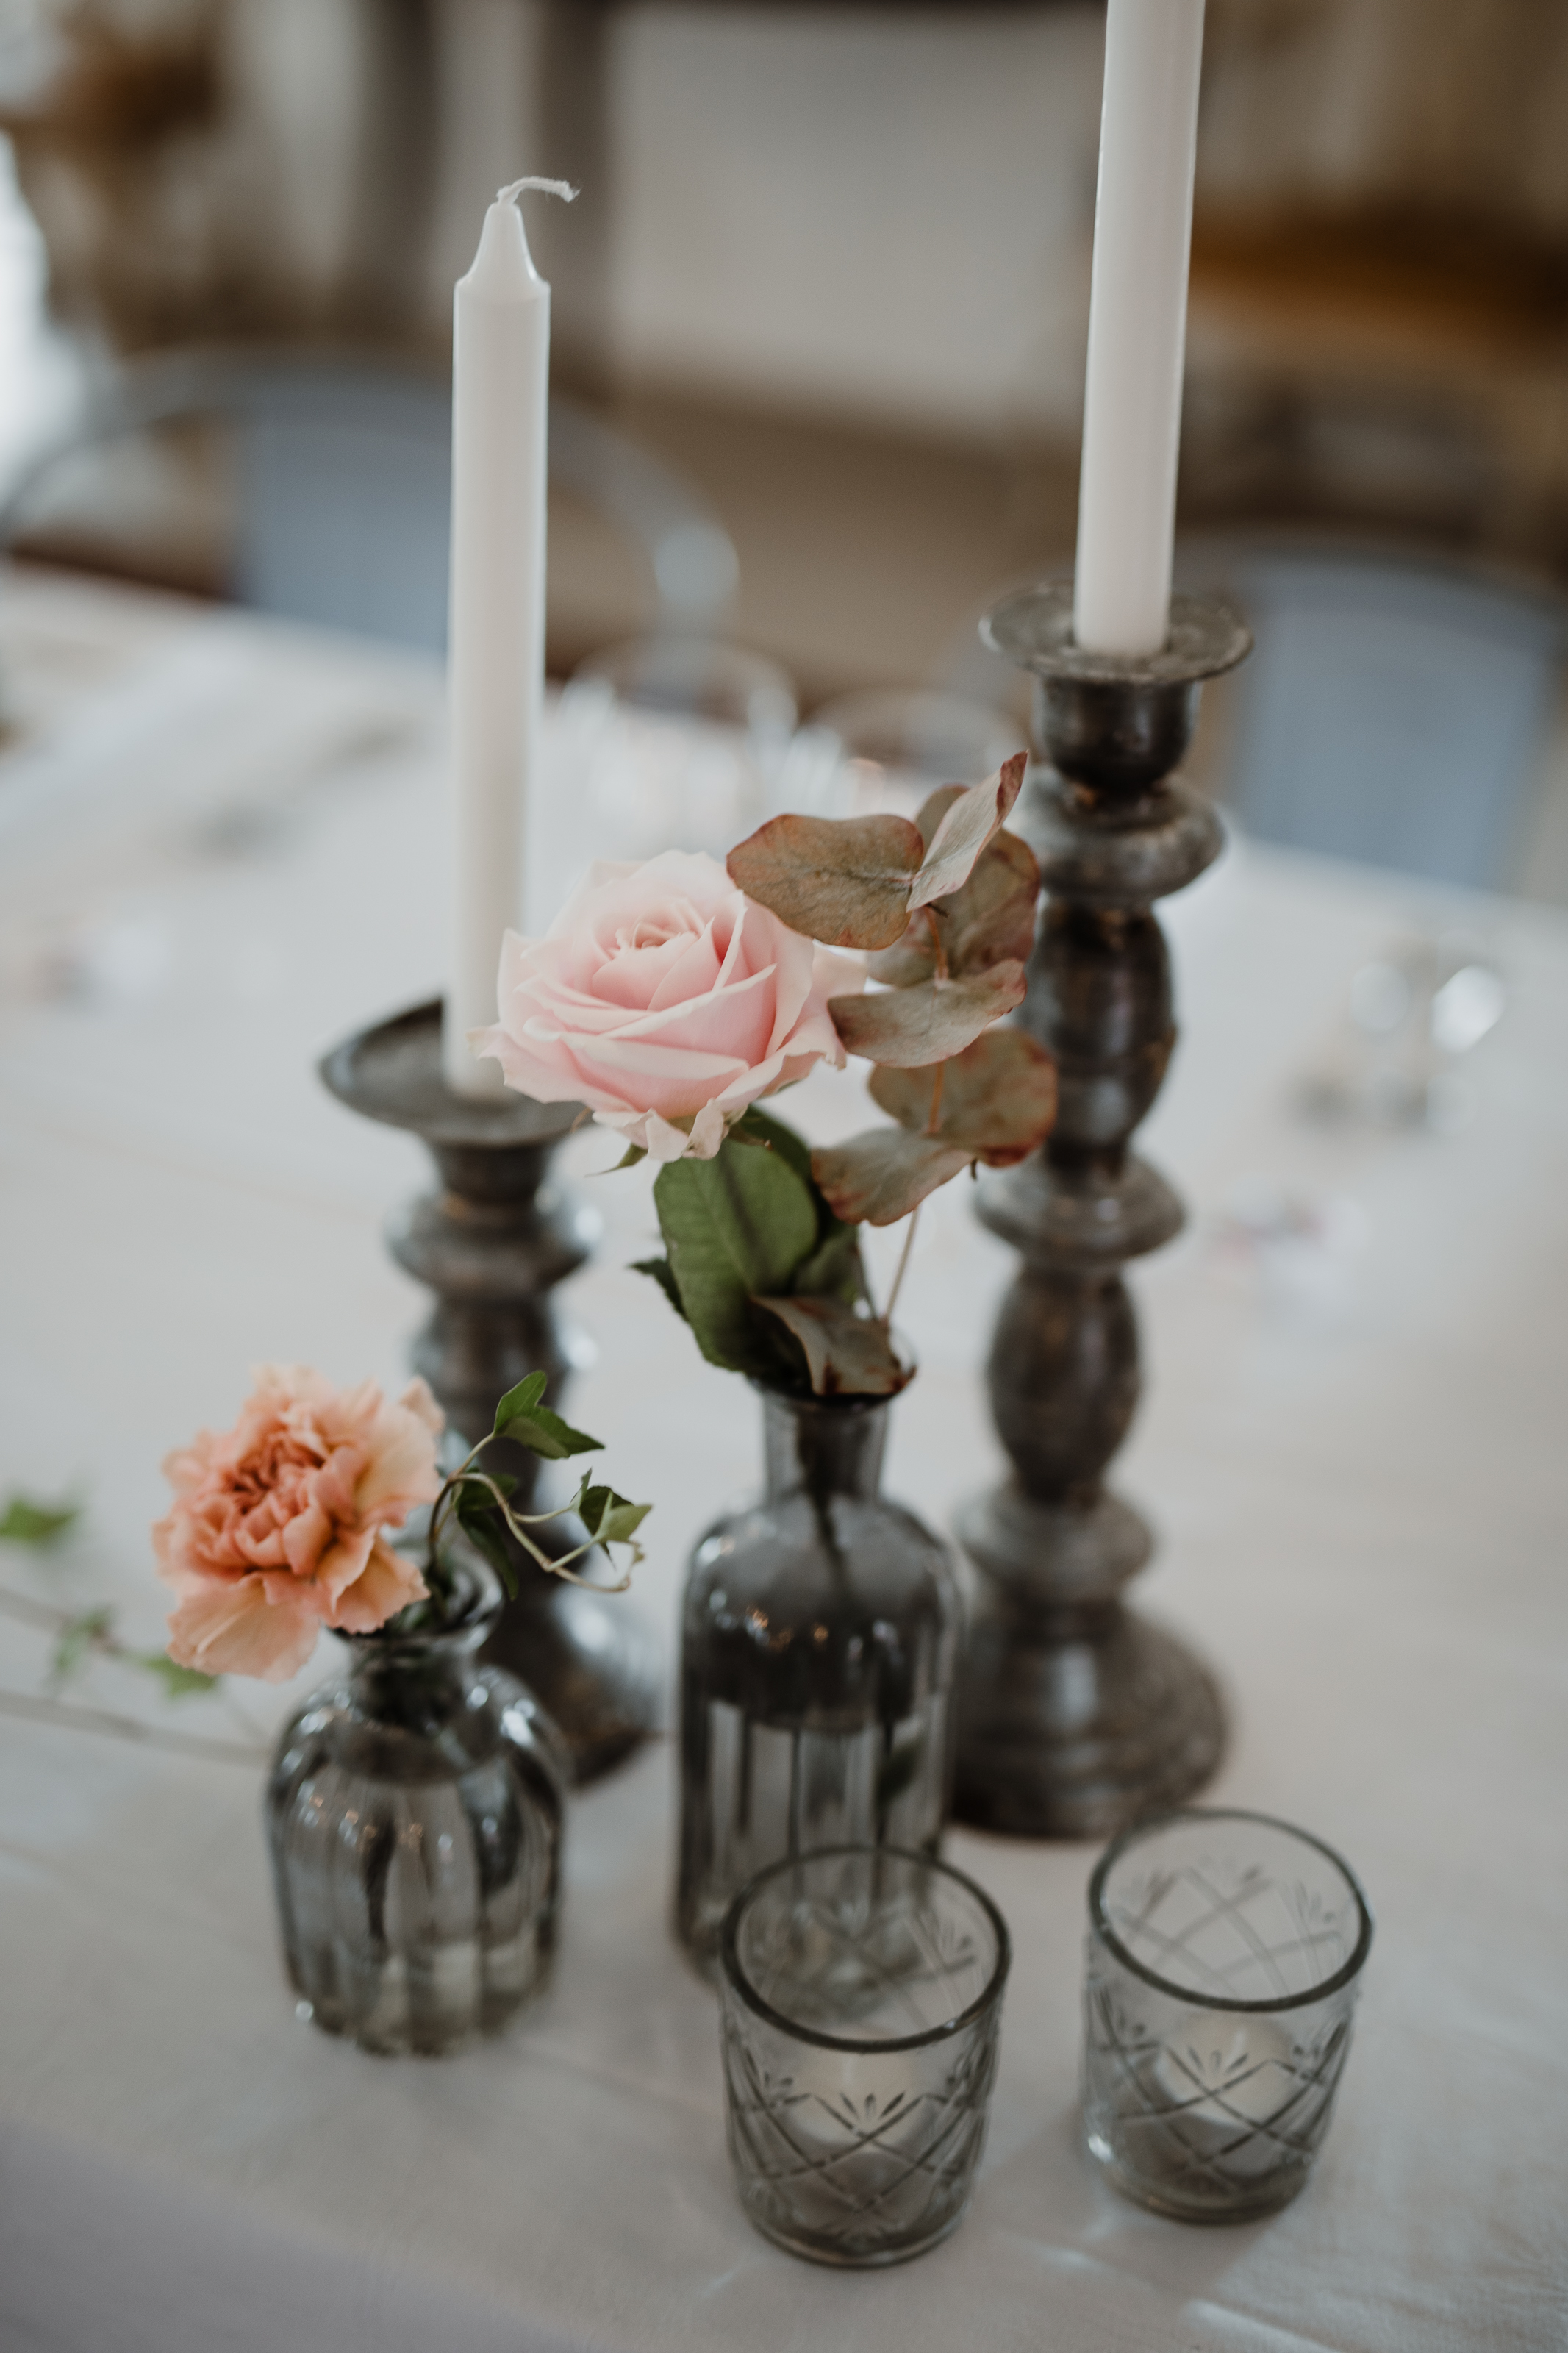 Bröllopsfotograf-Uddetorp Säteri-Höstbröllop-Fotograf Emilia- Bröllopsfotograf Borås-30.jpg